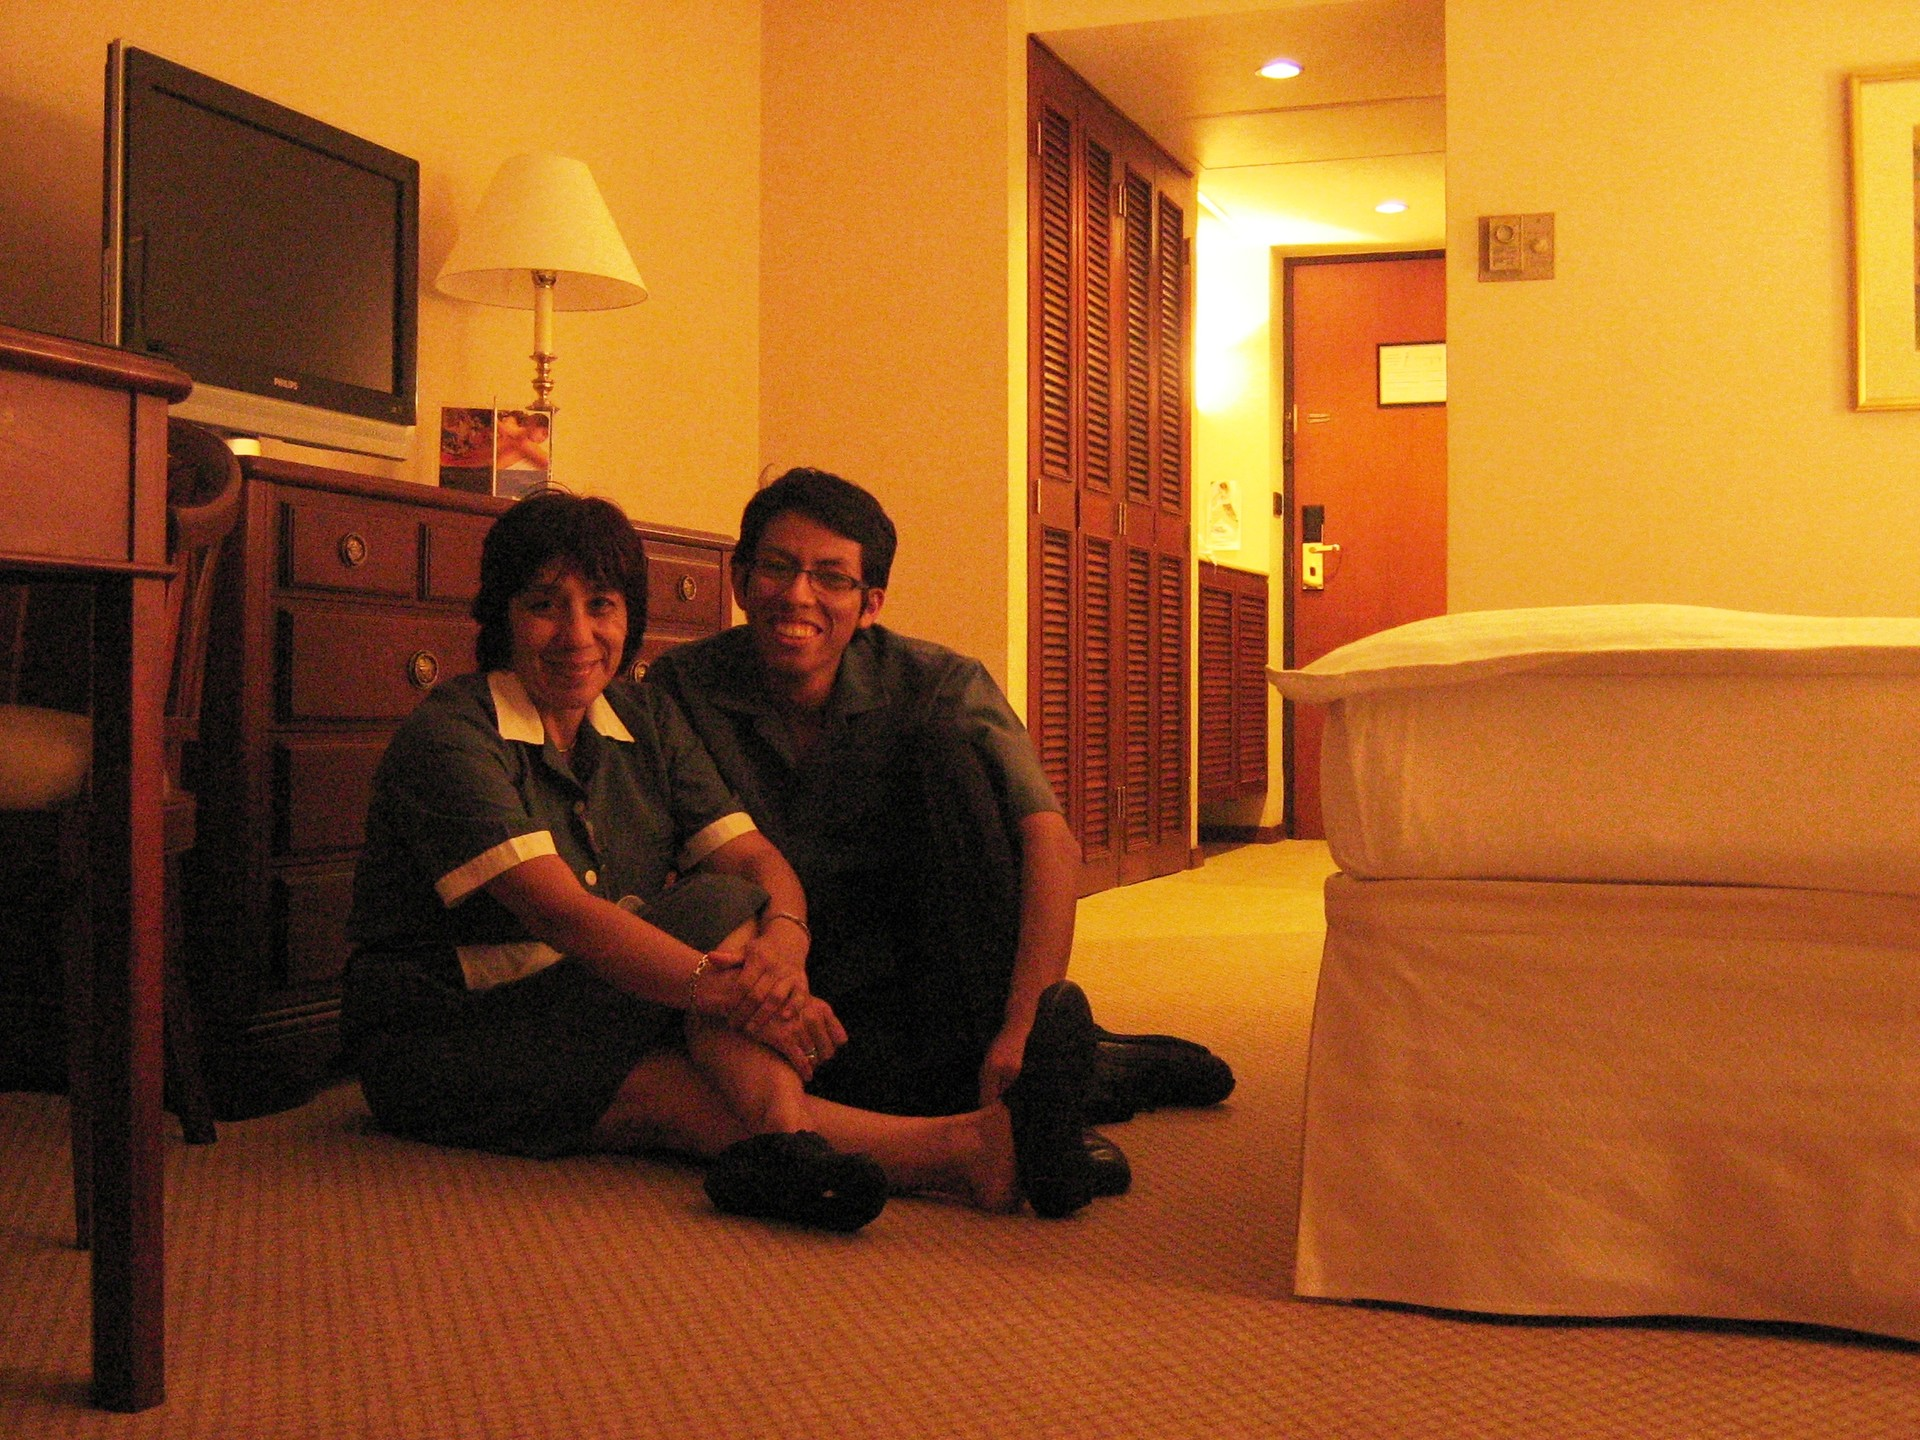 Swissotel Lima, mi primera experiencia hotelera | Blog Erasmus Lima ...